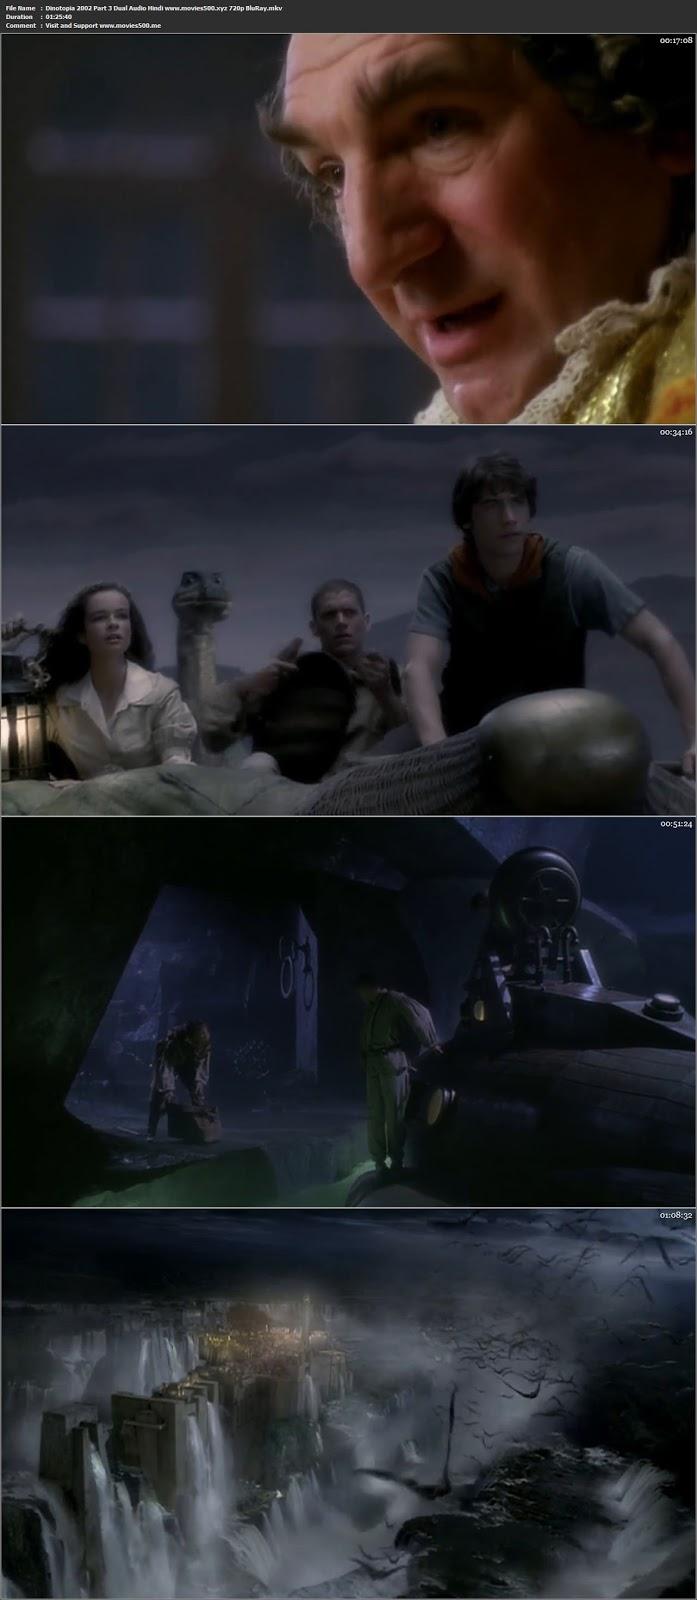 Dinotopia 2002 Part 3 Dual Audio Hindi Full Movie BluRay 720p at movies500.bid